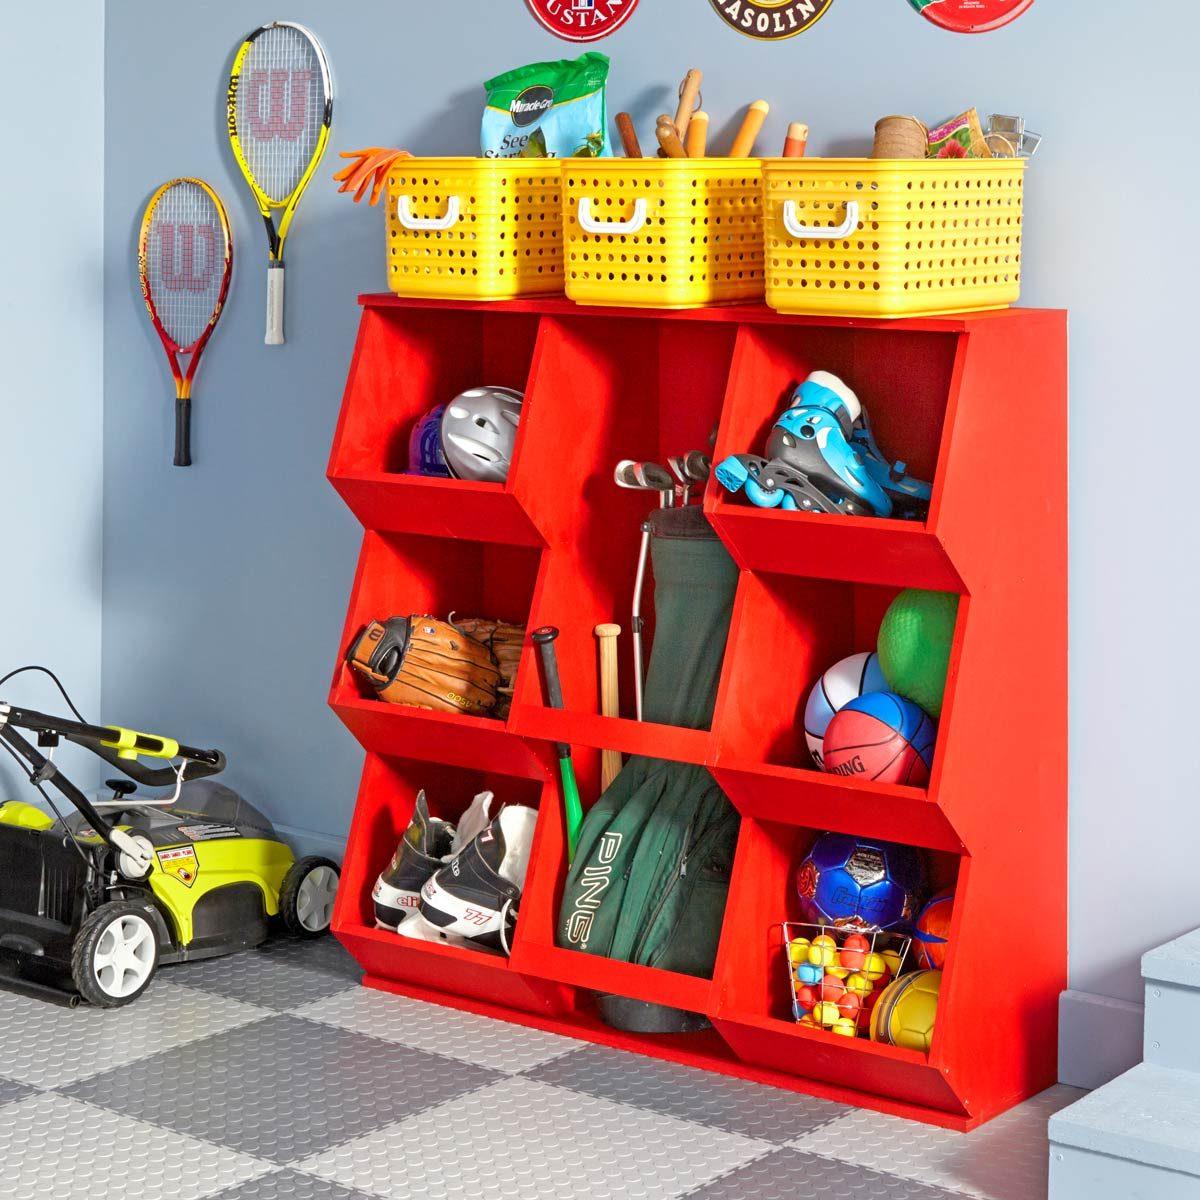 Easy Toy Storage & 11 Ideas for Organizing Your Garage u2014 The Family Handyman